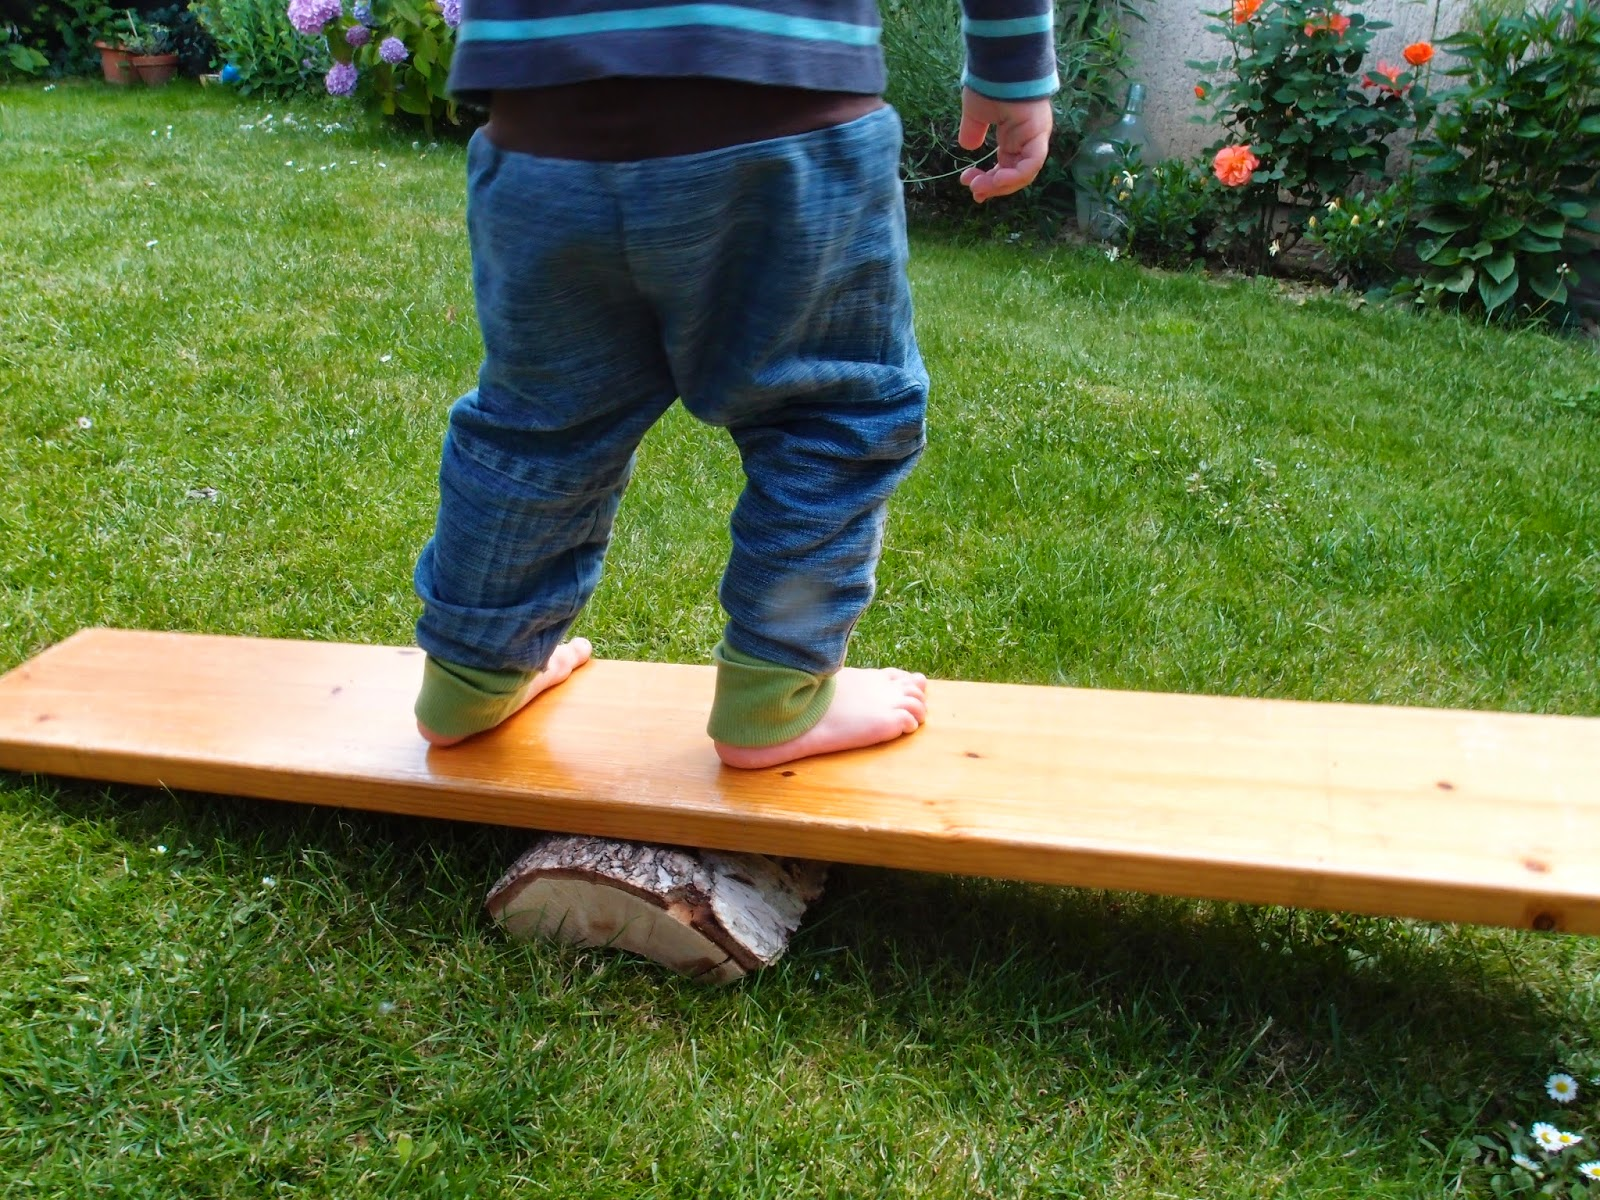 Rebelle upcycling bewegungsspiel aus altholz for Altholz look selber machen